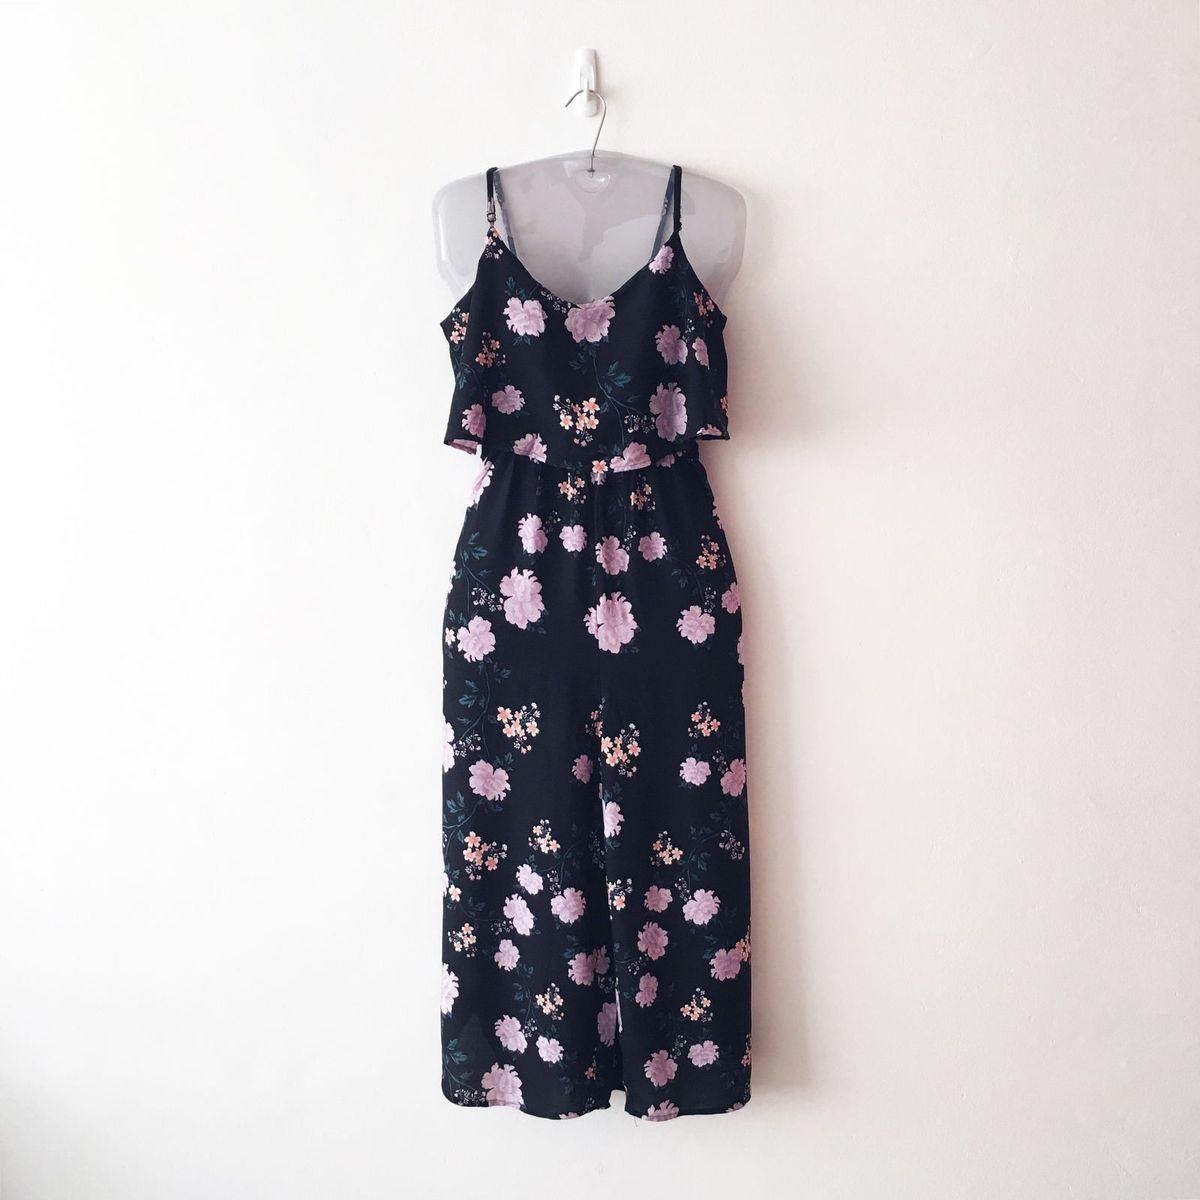 f060841135 macacão pantacourt floral tendência fashion básico estampado longo  romântica verão midi enjoei pro. - vestidos